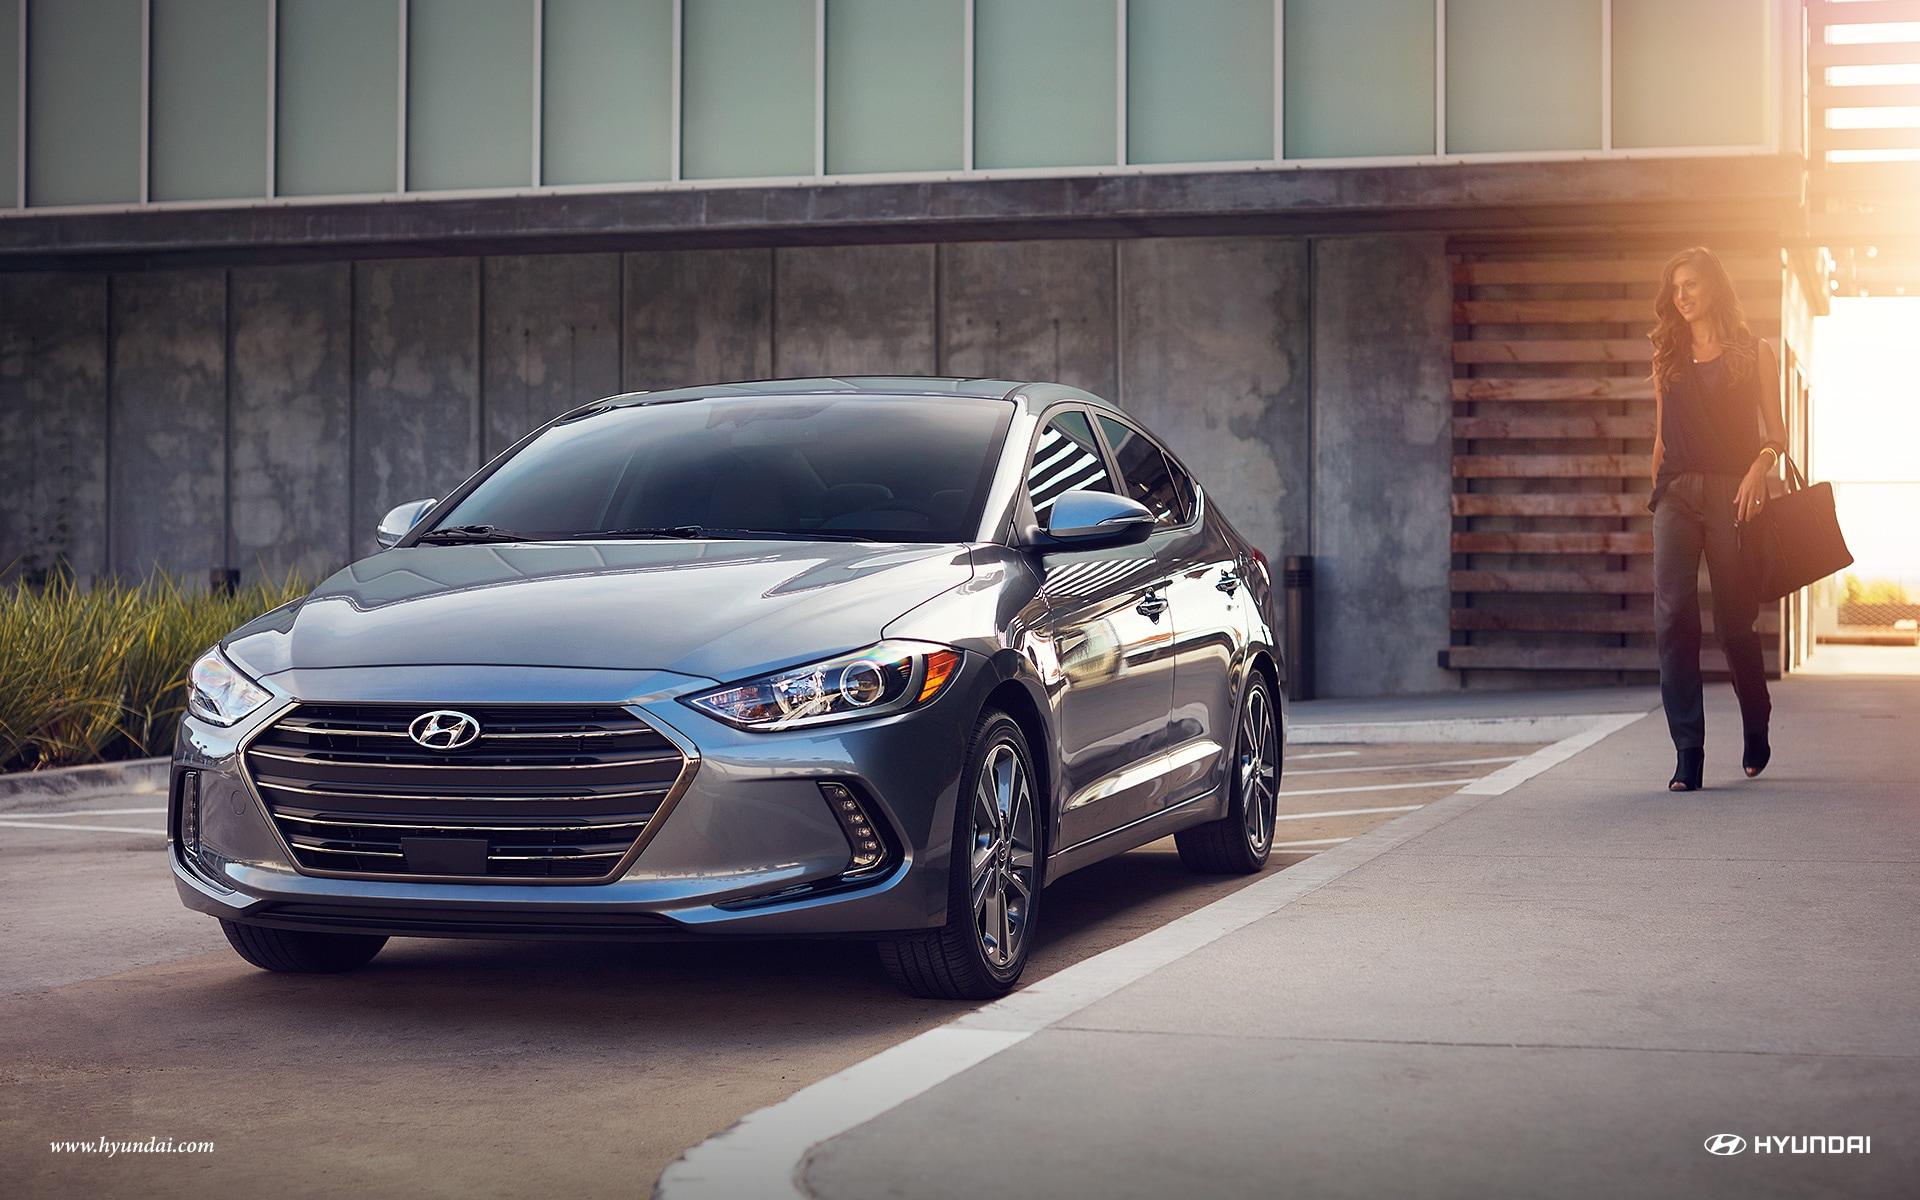 2017 Hyundai Models Near Quakertown | Emmaus Hyundai Dealer